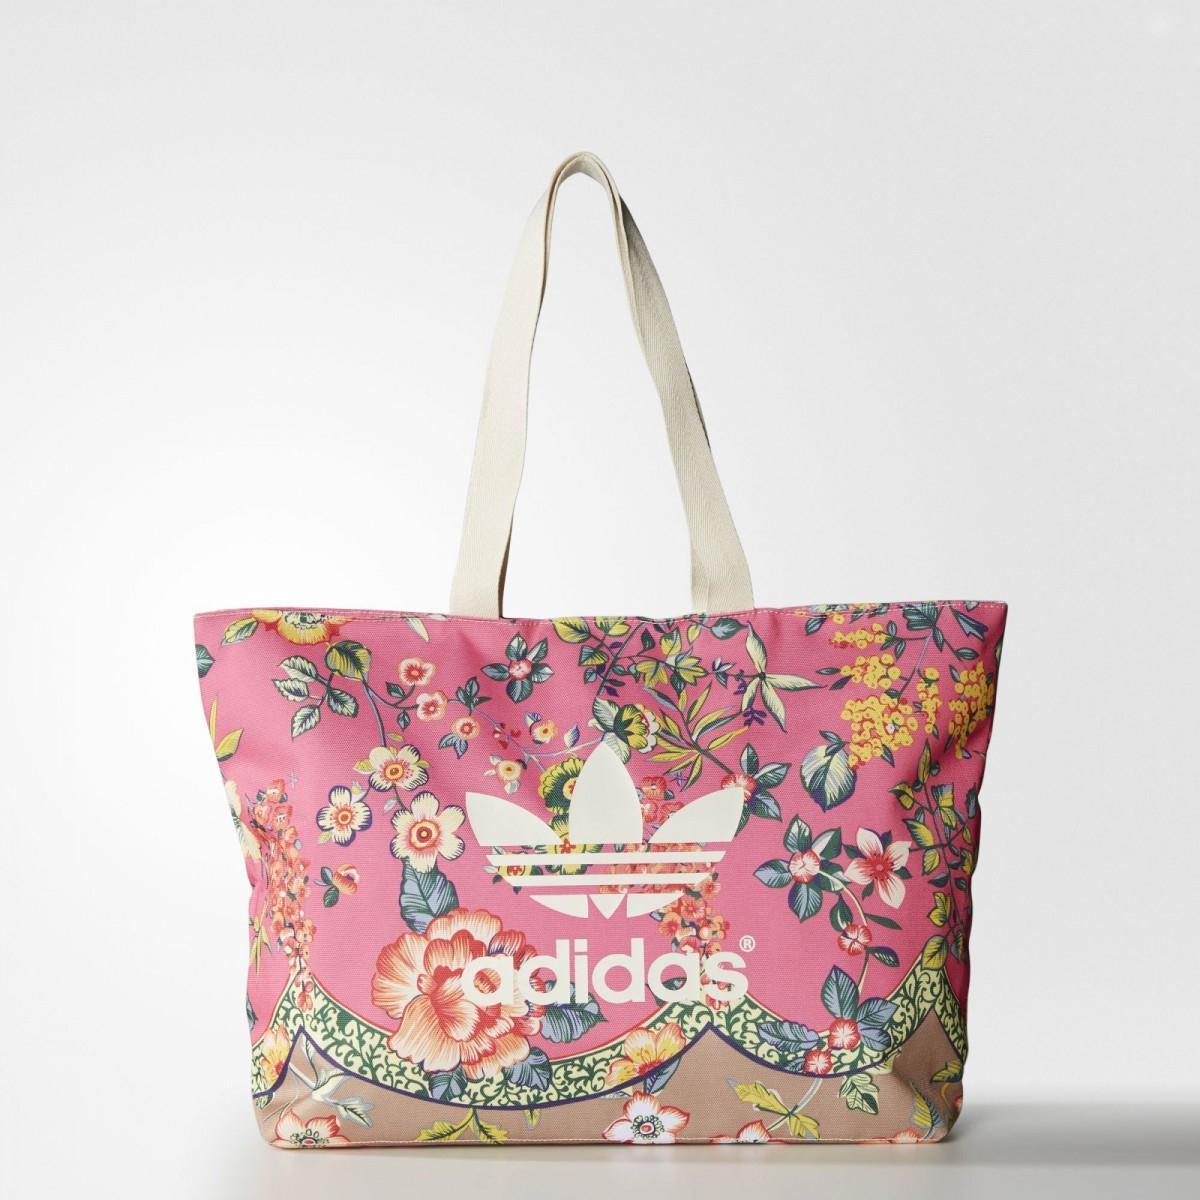 Adidas Tasche SHOPPER JARDINETO 22,12 € + 3,12 € VSK bei Top12.de